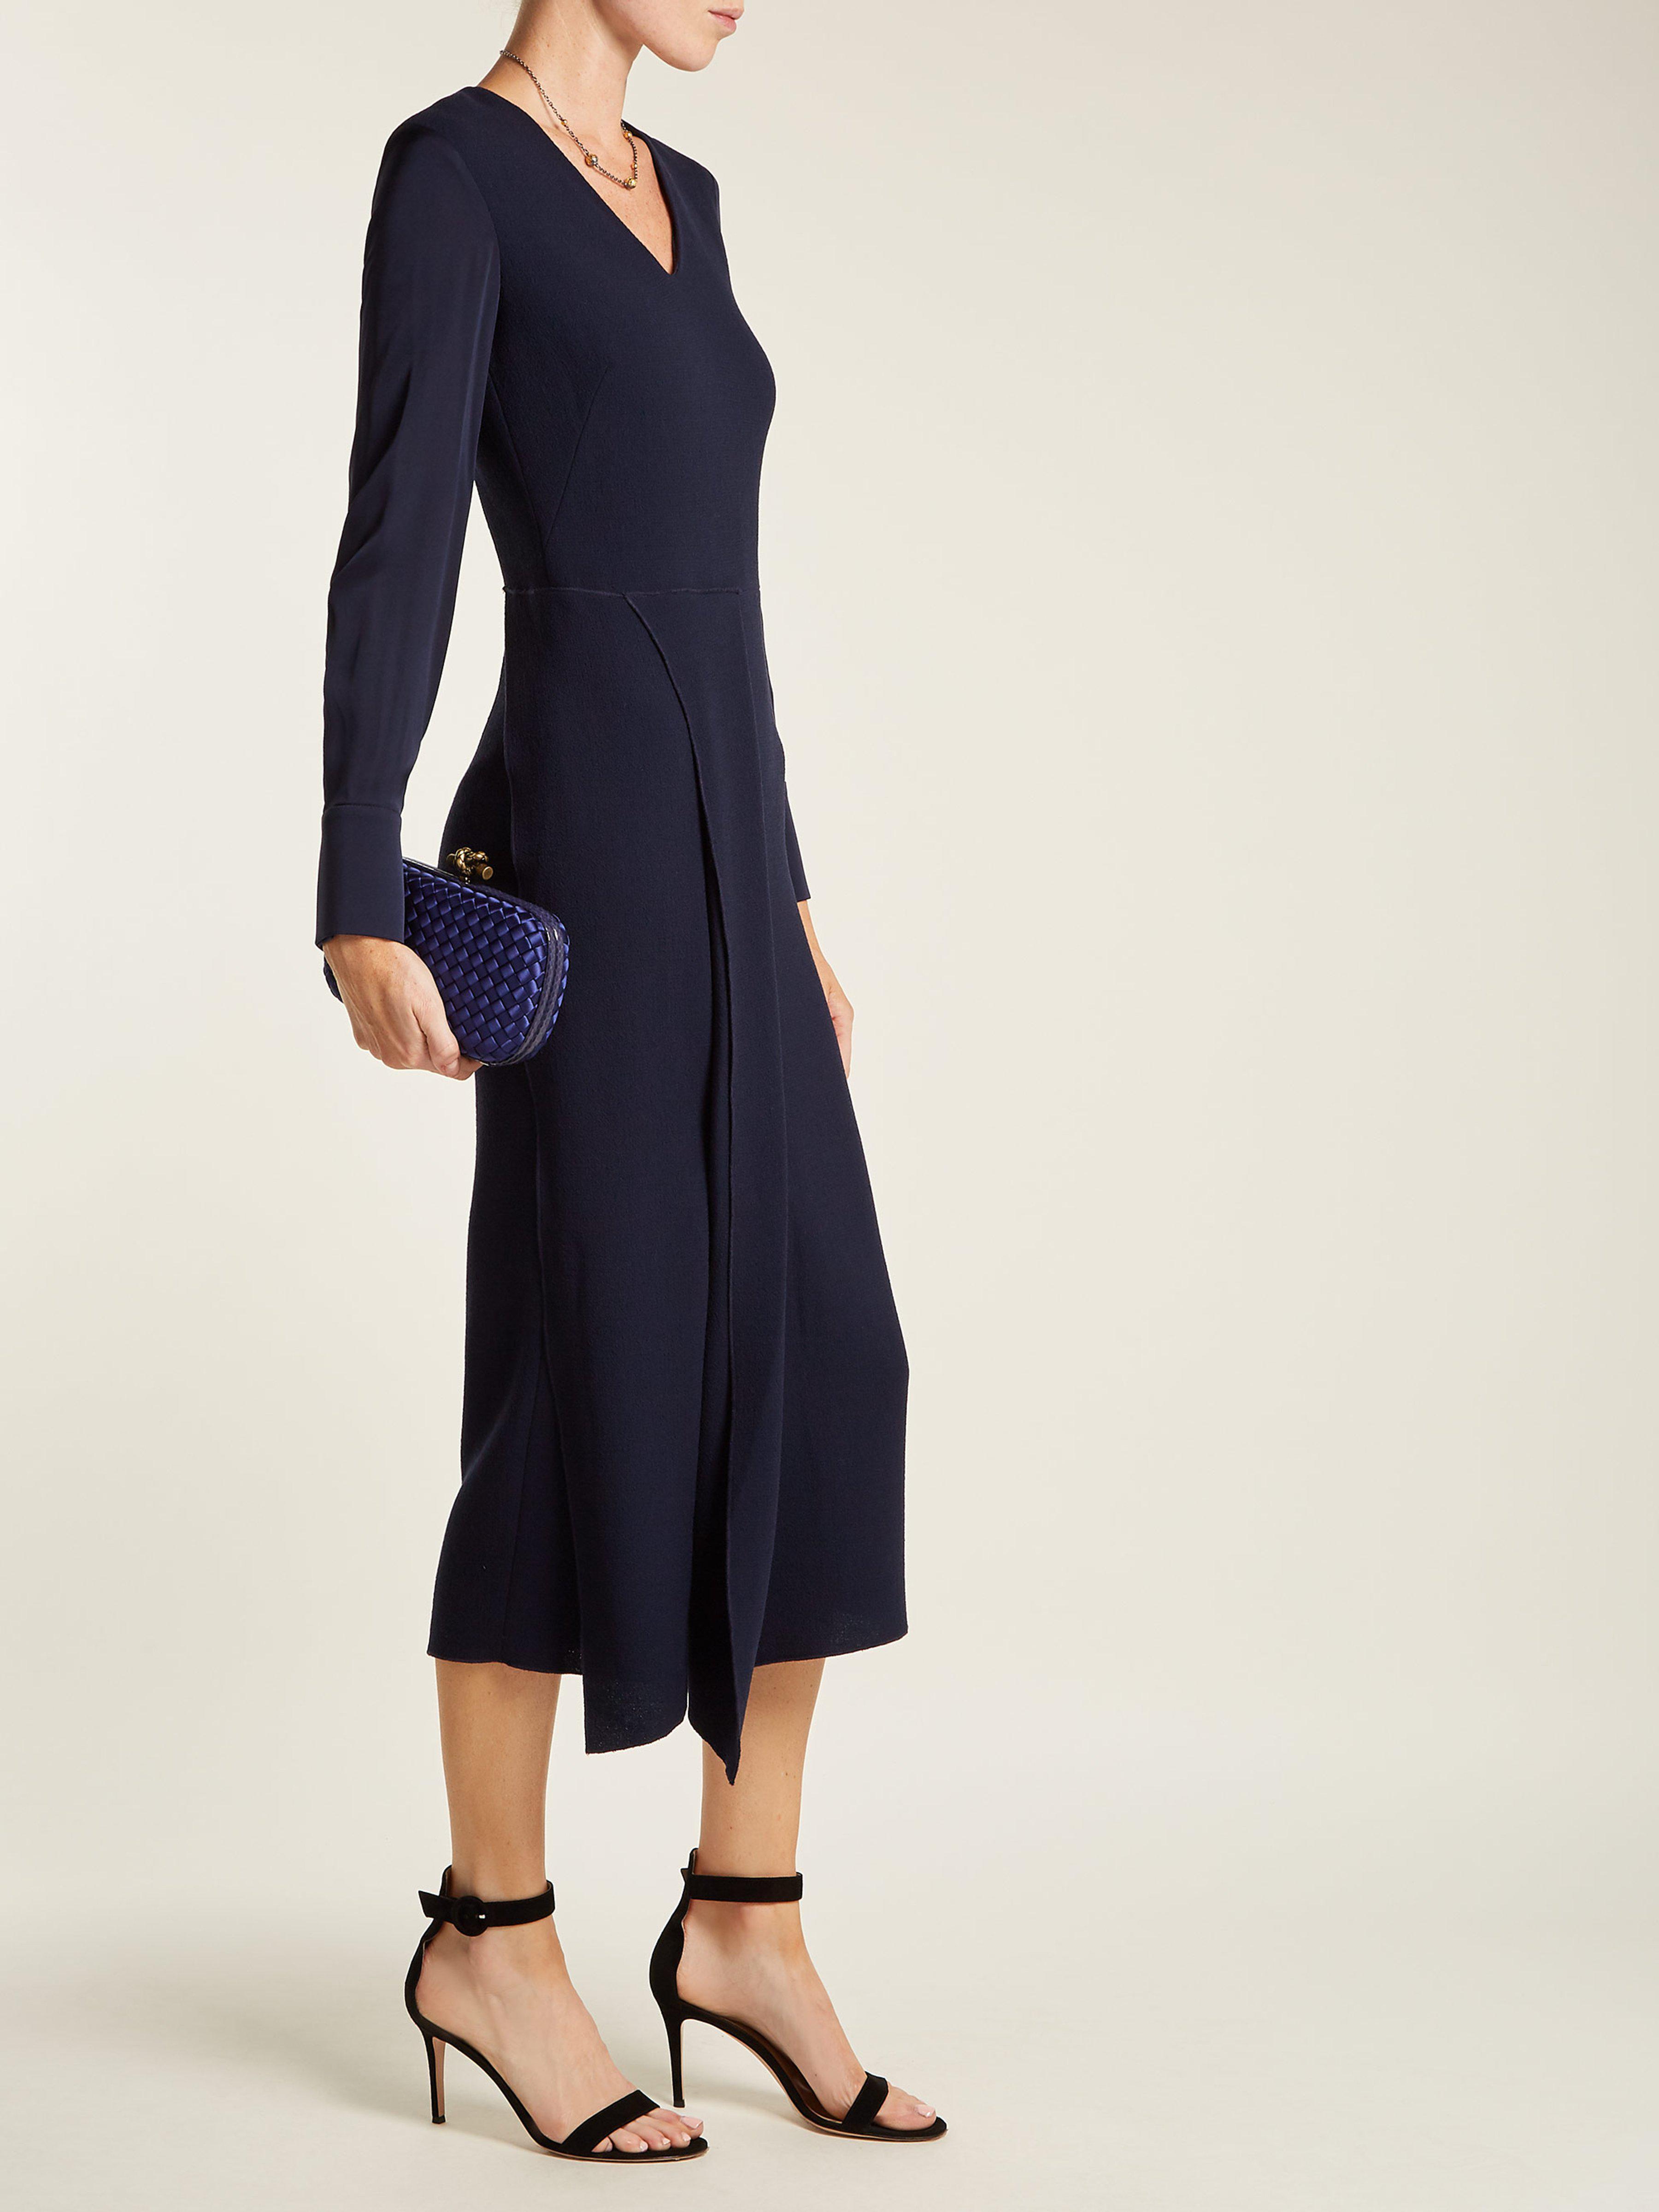 98825909c0 Bottega Veneta Knot Satin And Watersnake Clutch in Blue - Lyst